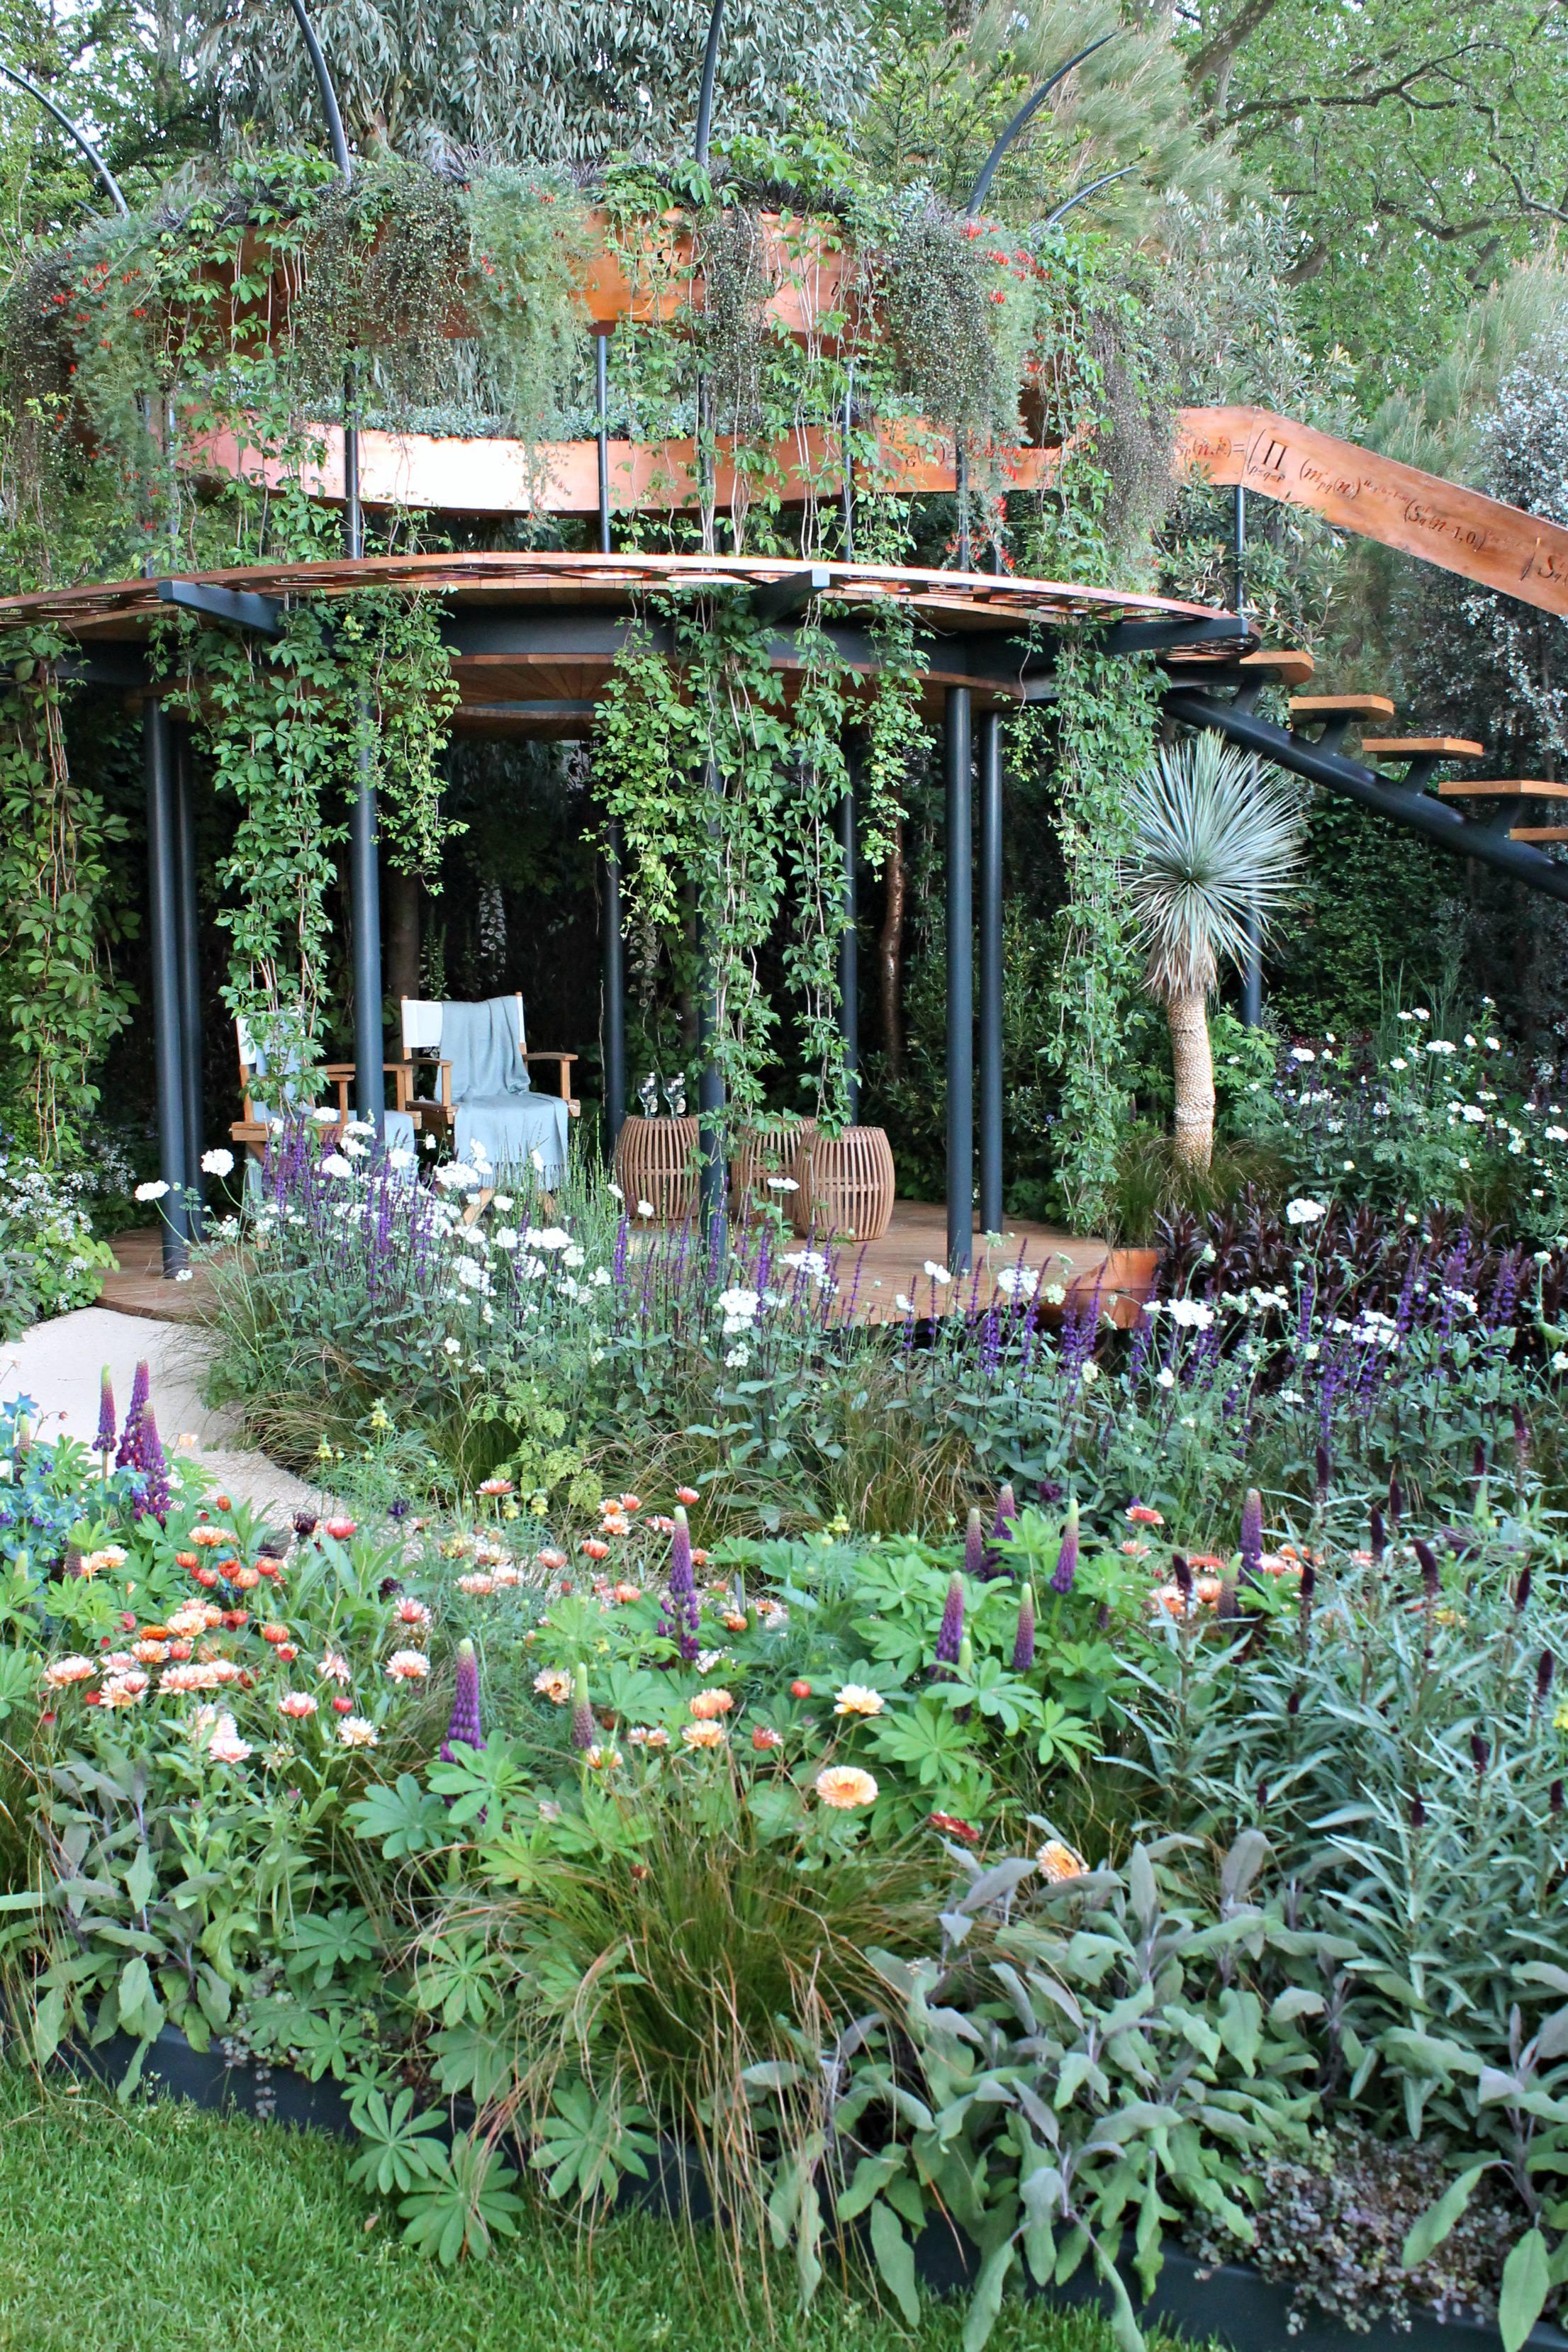 The-Winton-beauty-of-Mathematics-Garden-photo-by-Geraldine-Tan-Little-Big-Bell